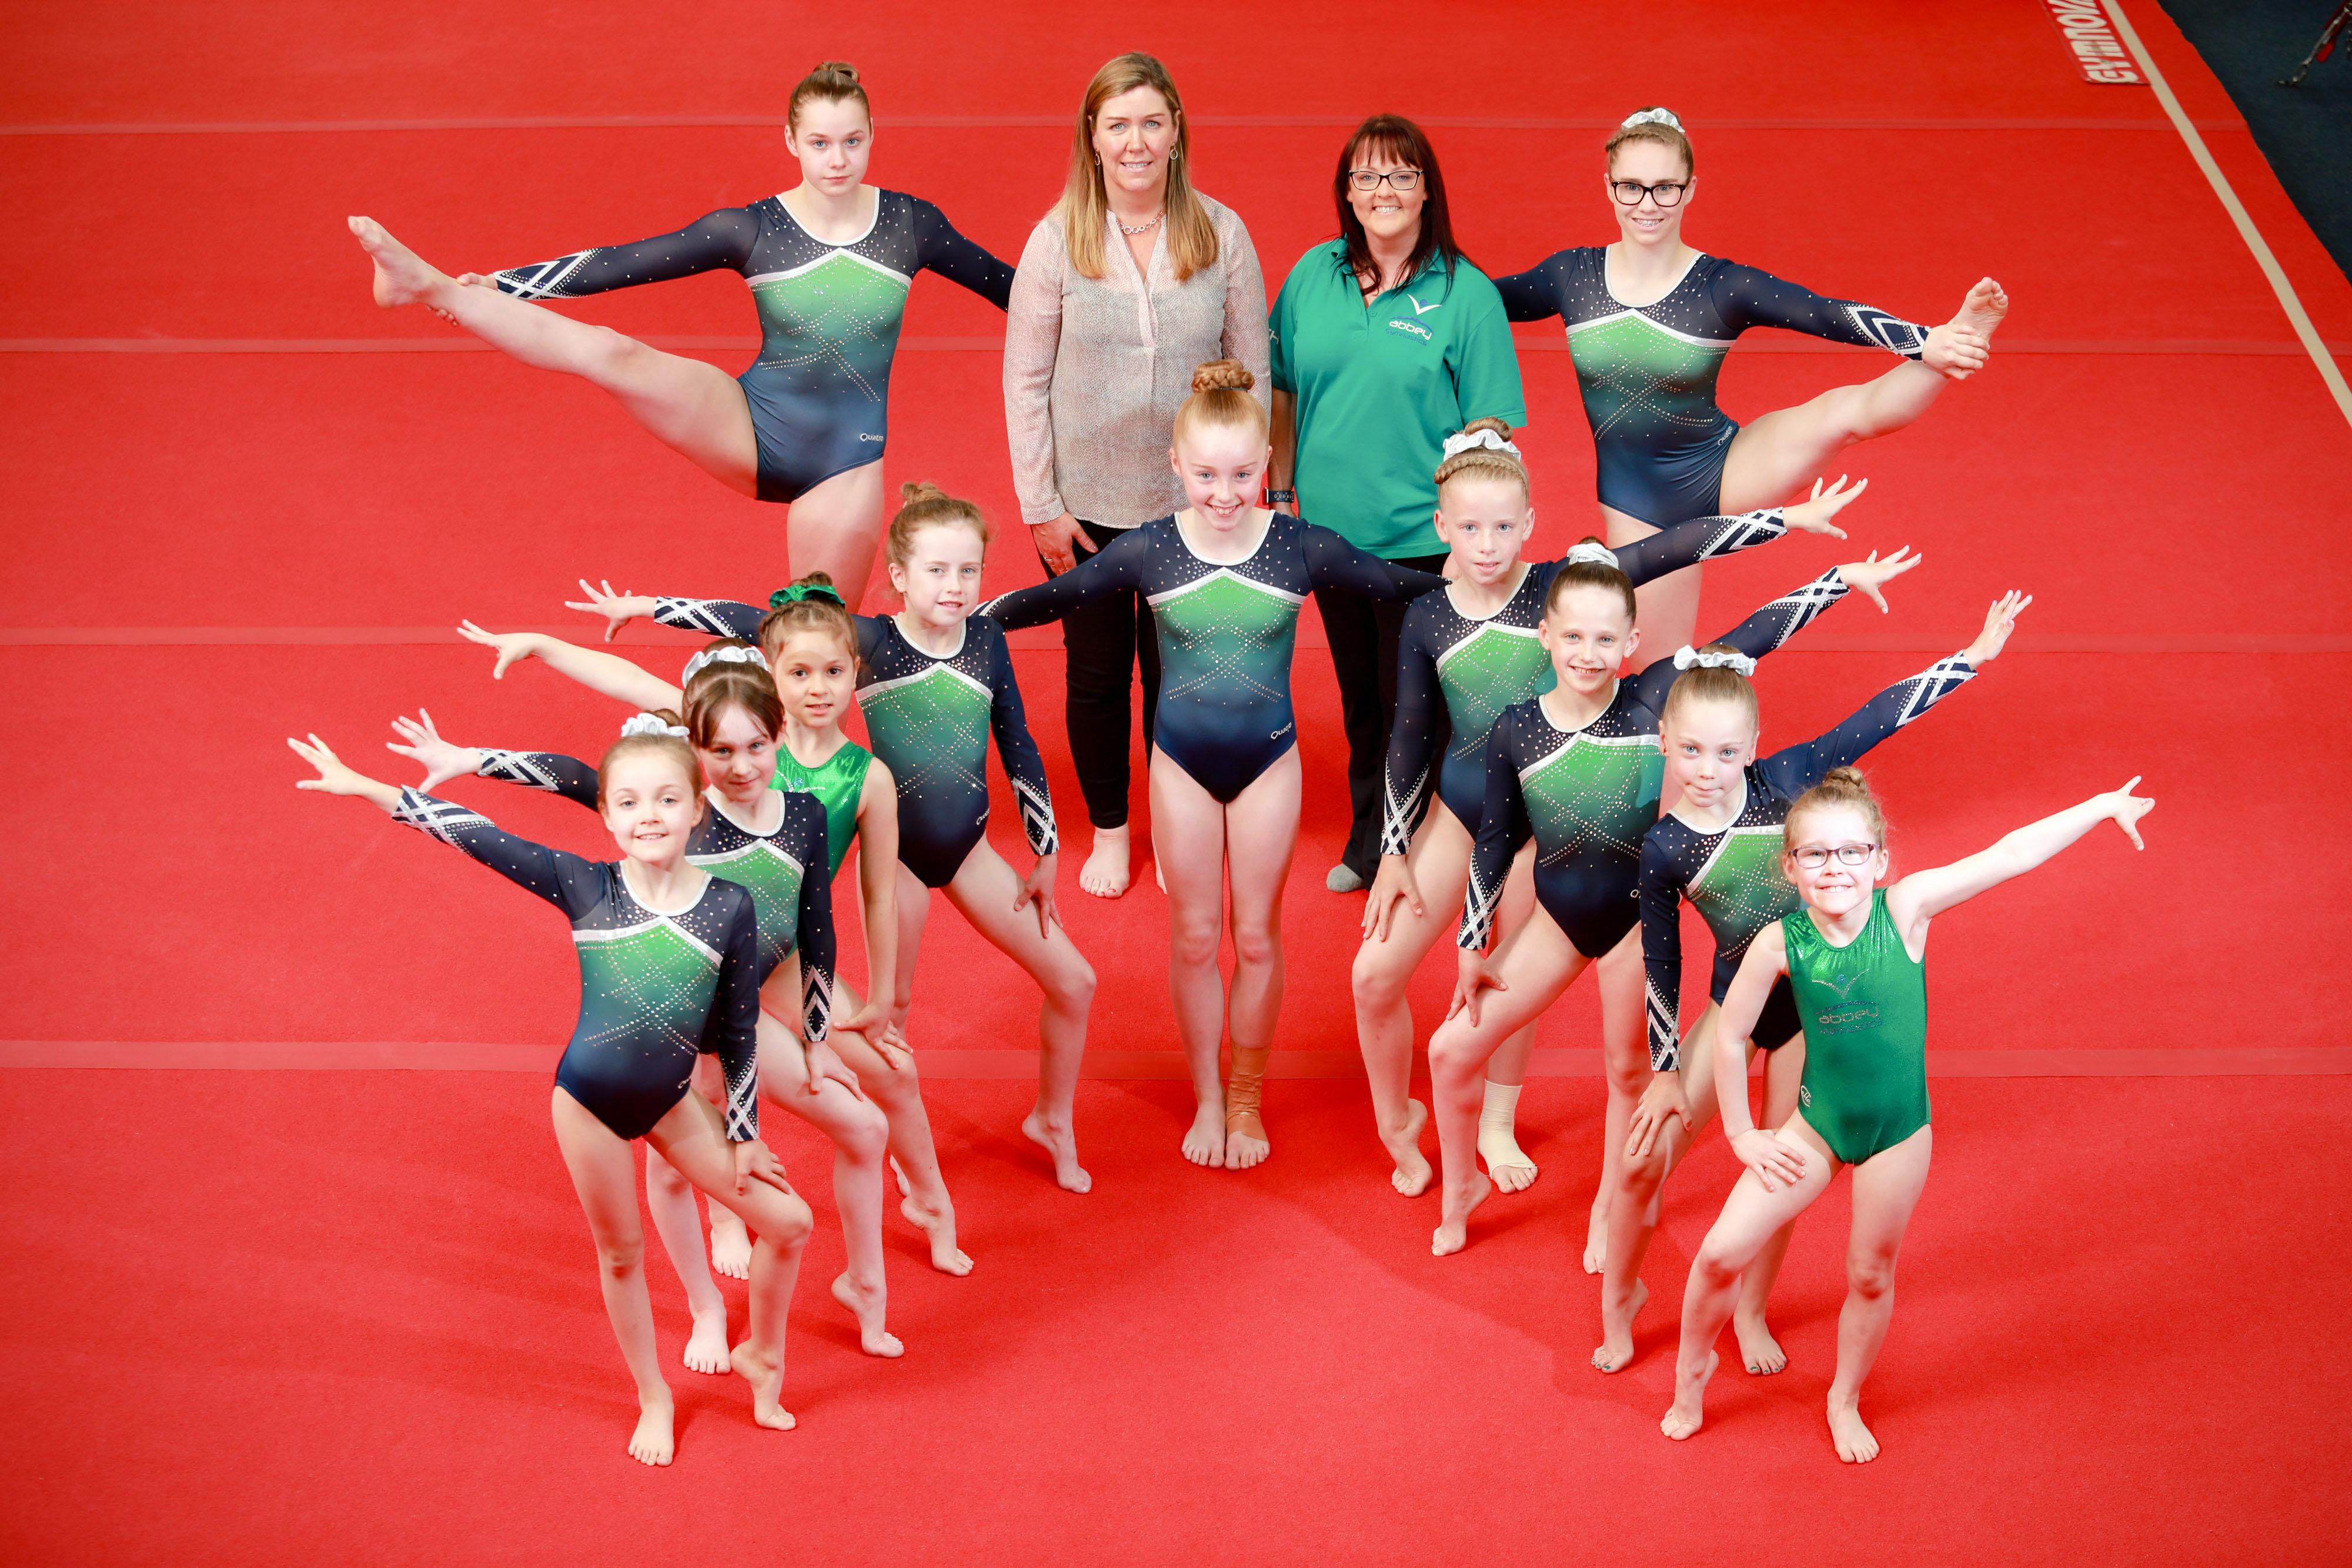 SPAR NI launches 2019 bid to boost community sport